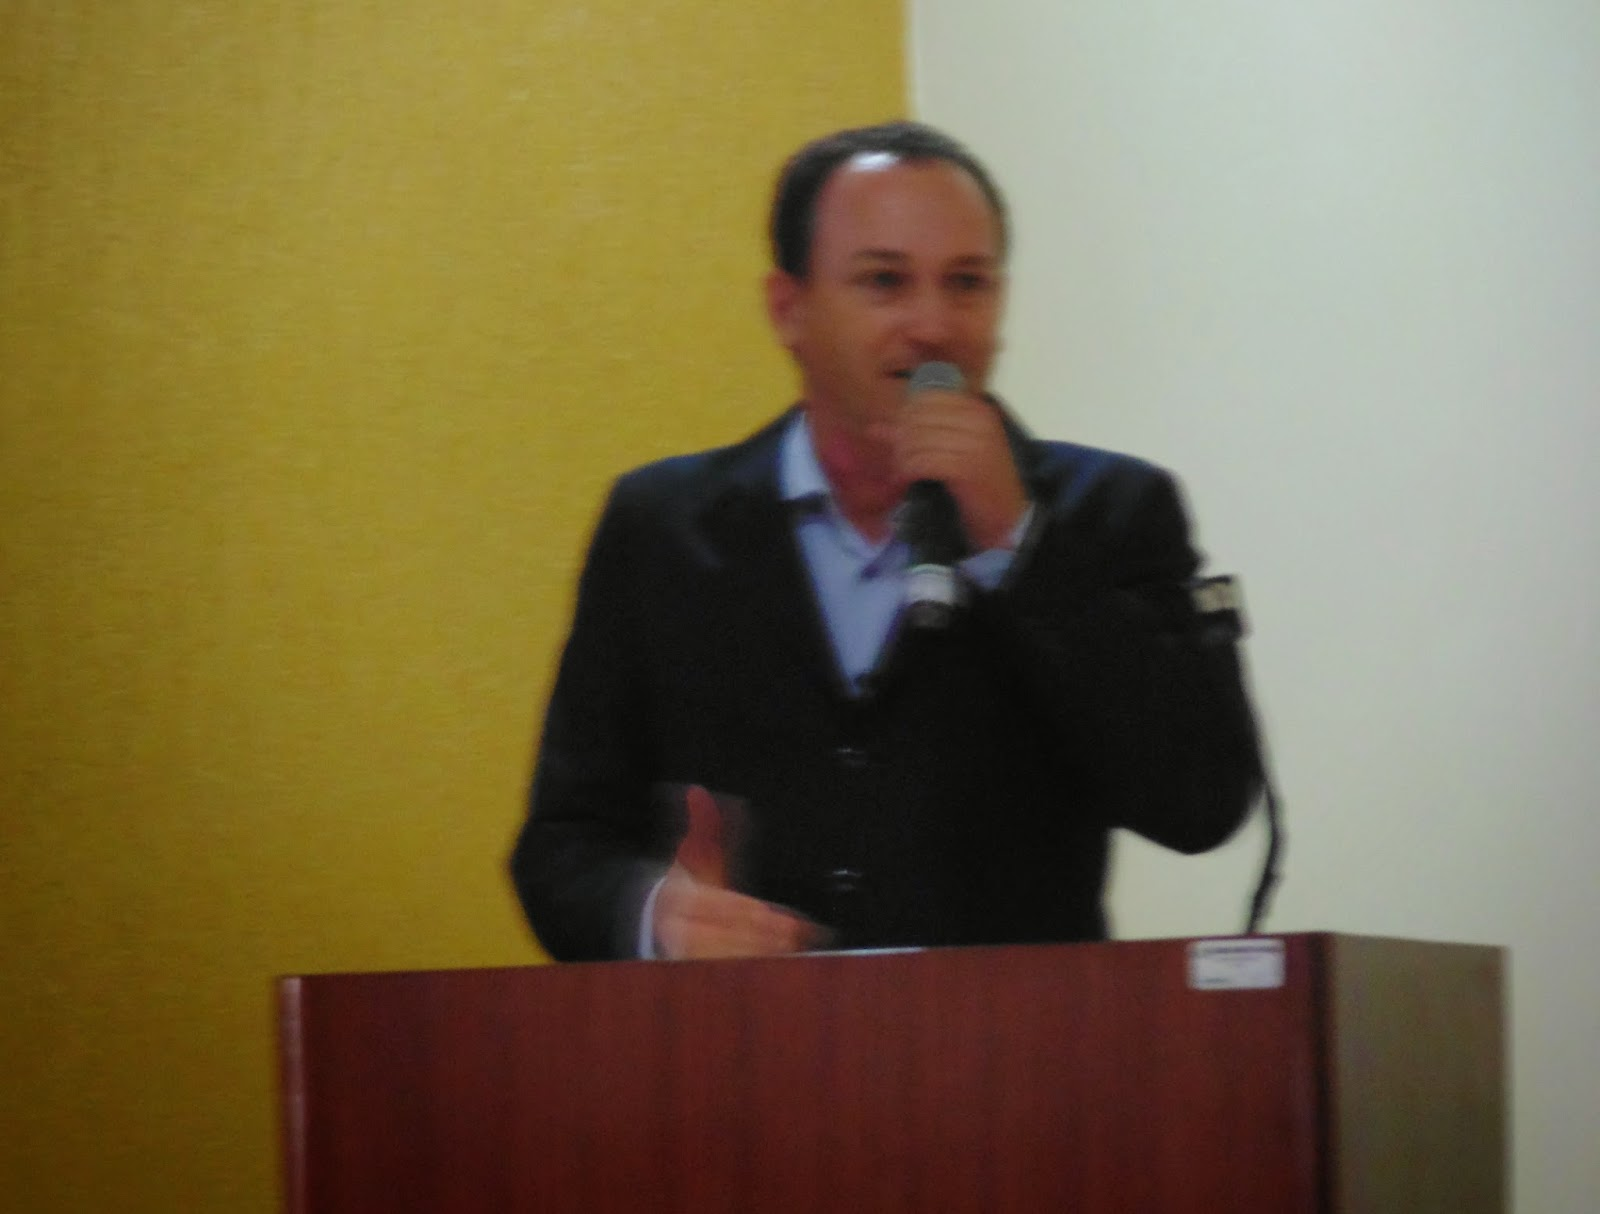 Ex-presidente da Câmara de vereadores de Panelas Weliton Saraiva é multado